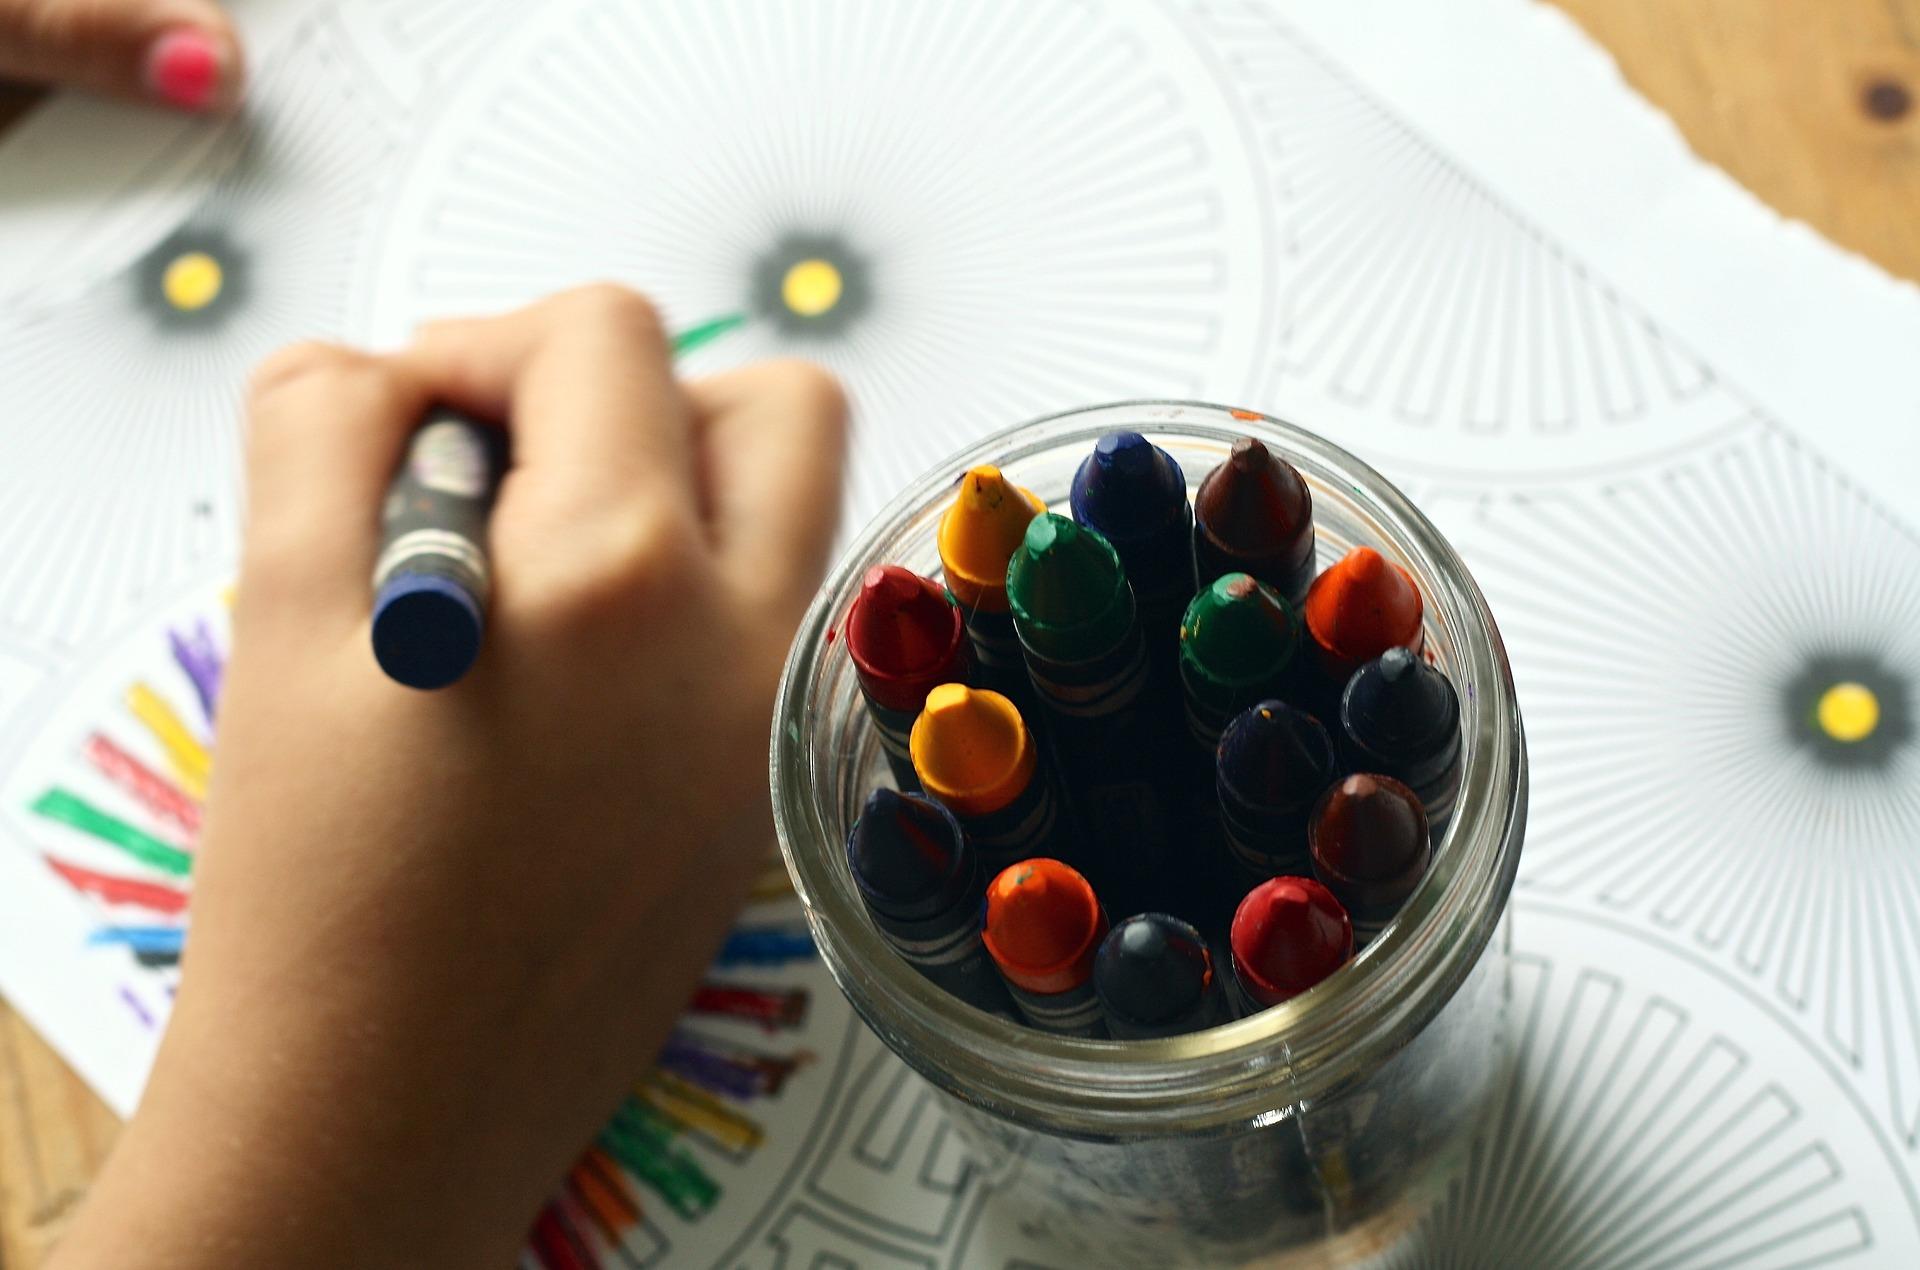 /Pulseem/ClientImages/2888///crayons-1445053_1920.jpg